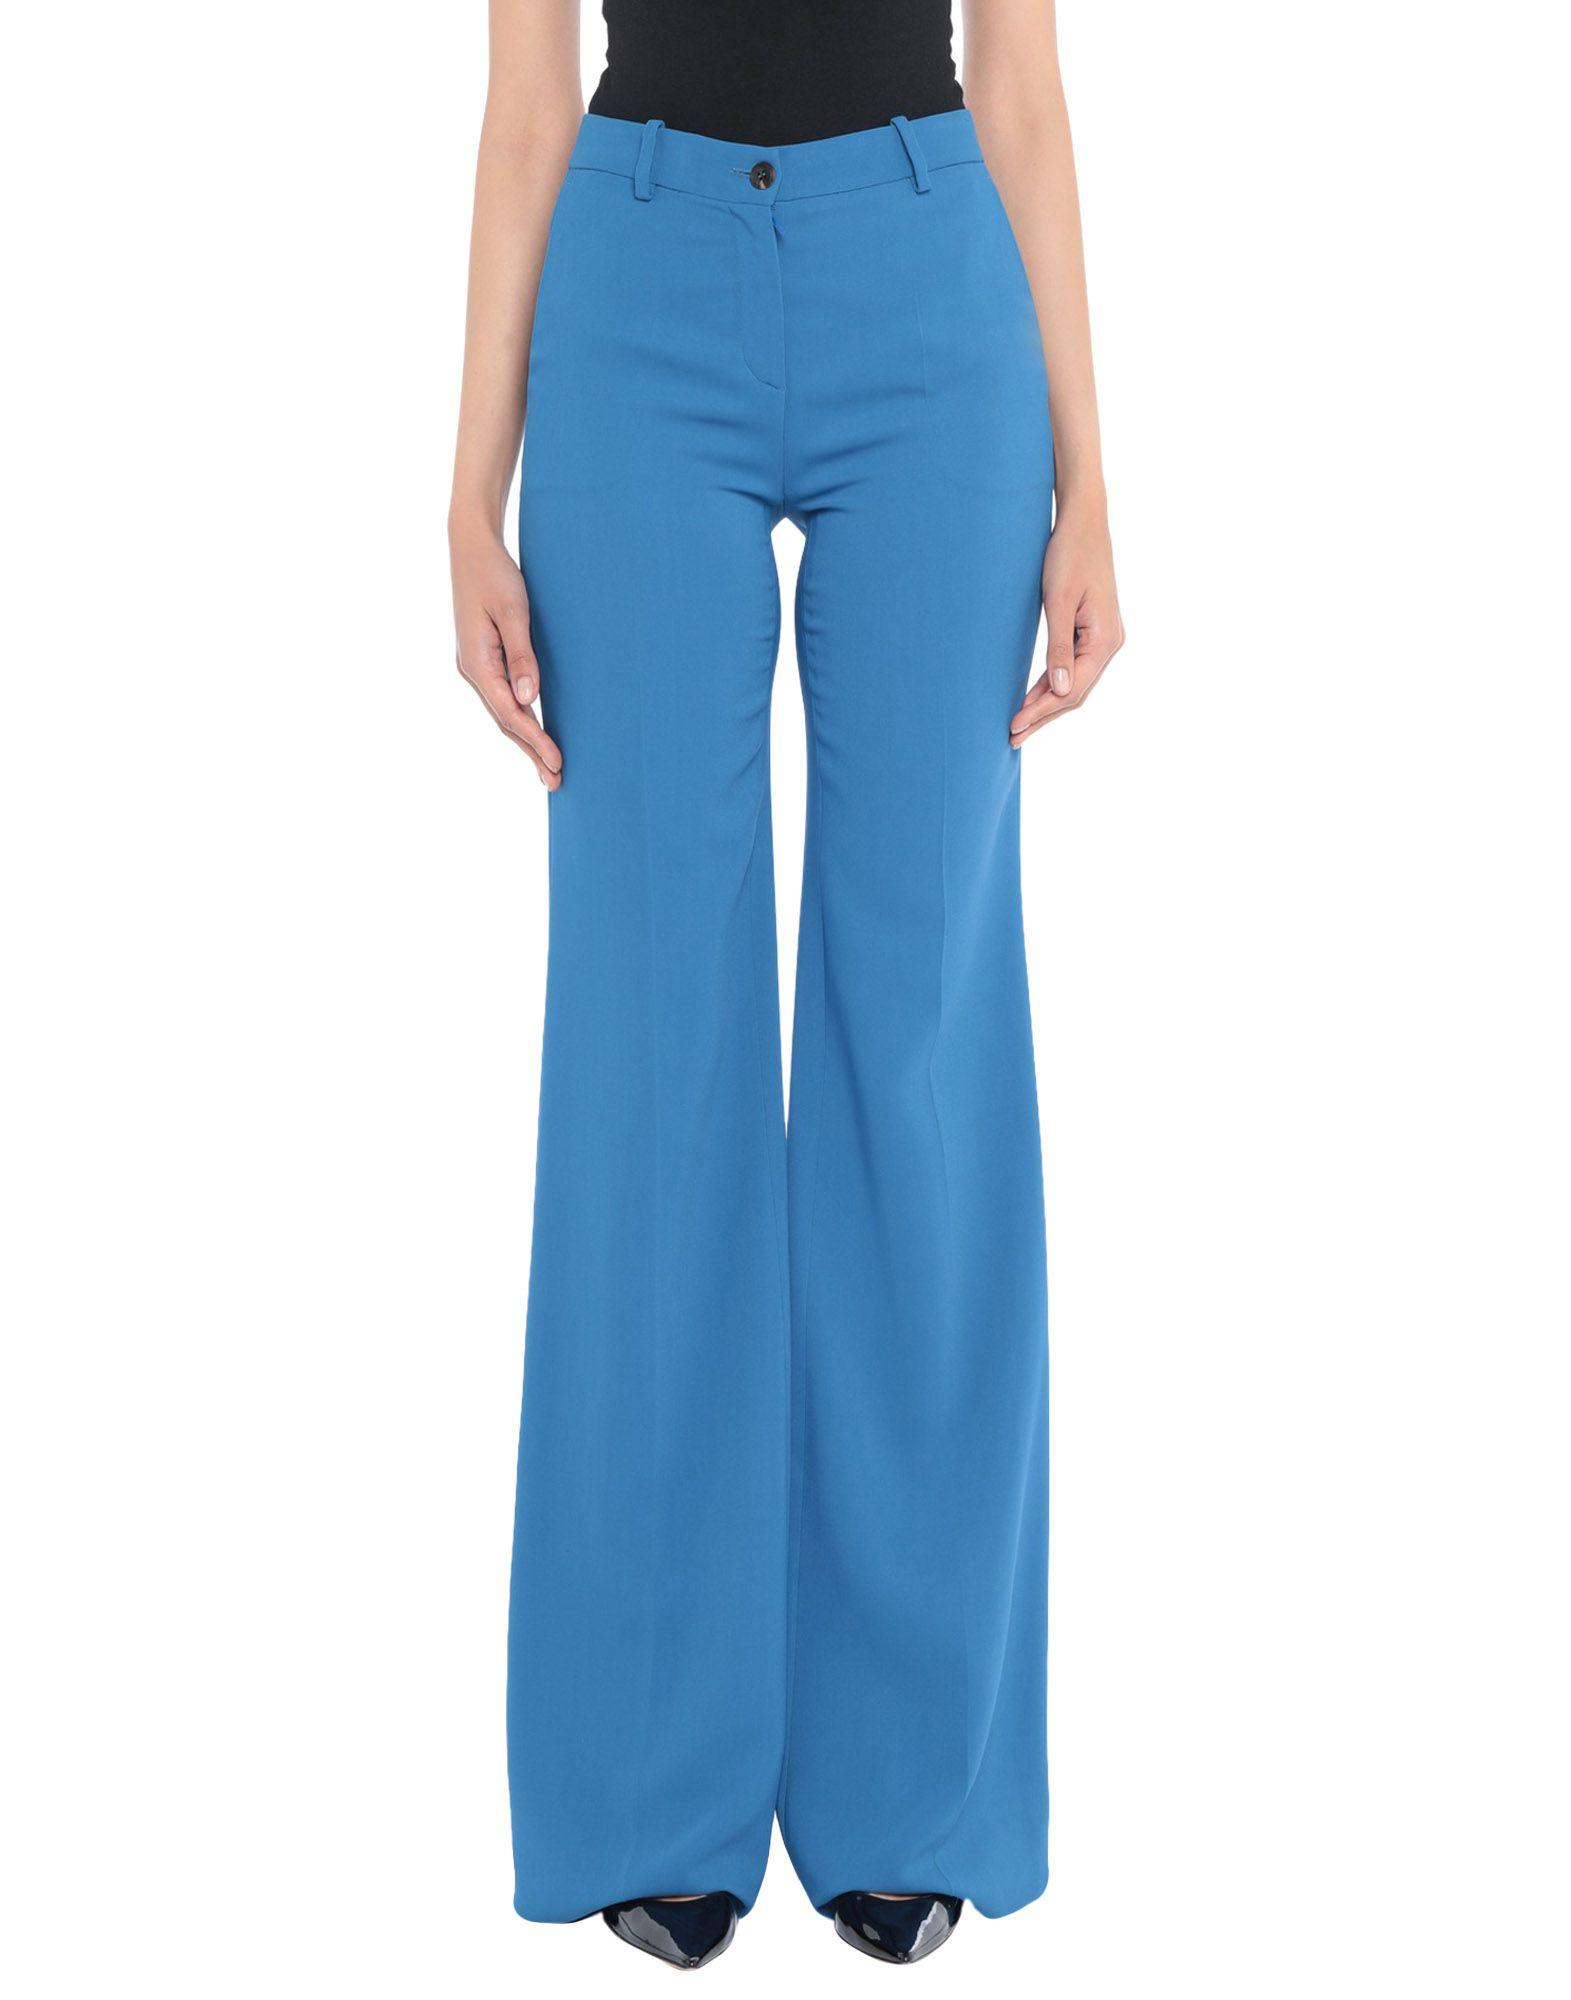 Pantalone Roberto Cavalli donna - 13347544FJ